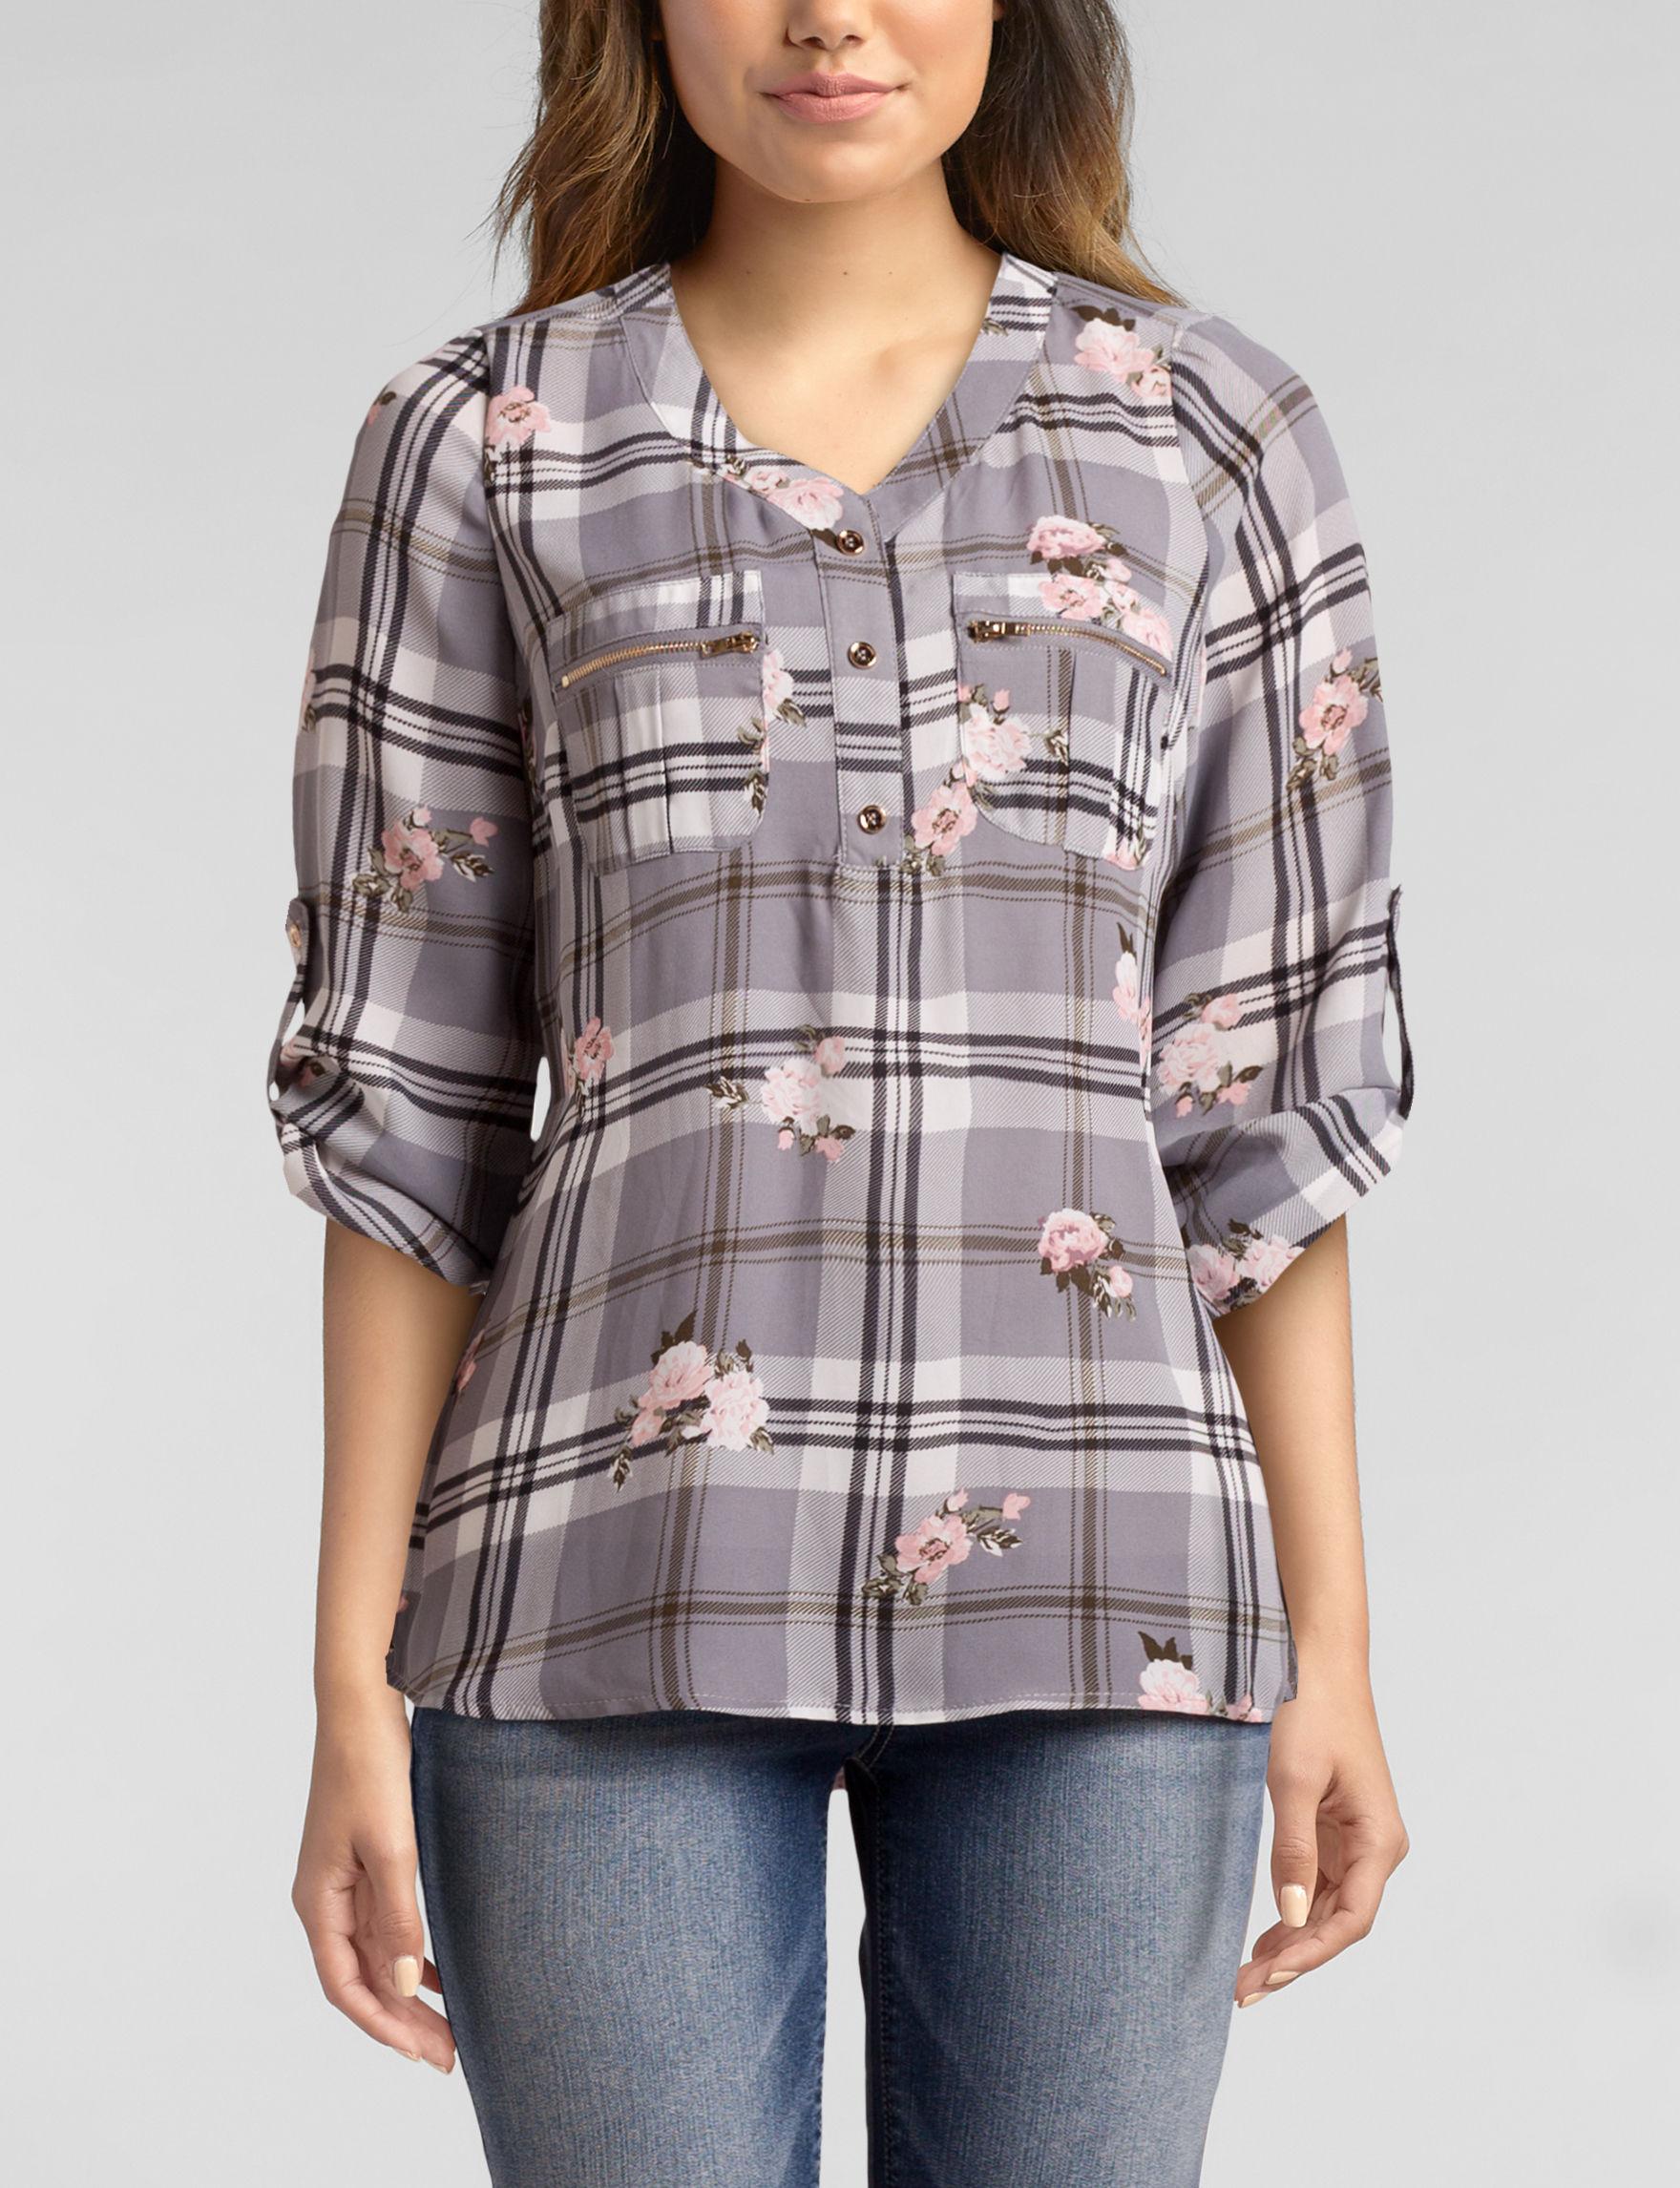 Wishful Park Grey Plaid Shirts & Blouses